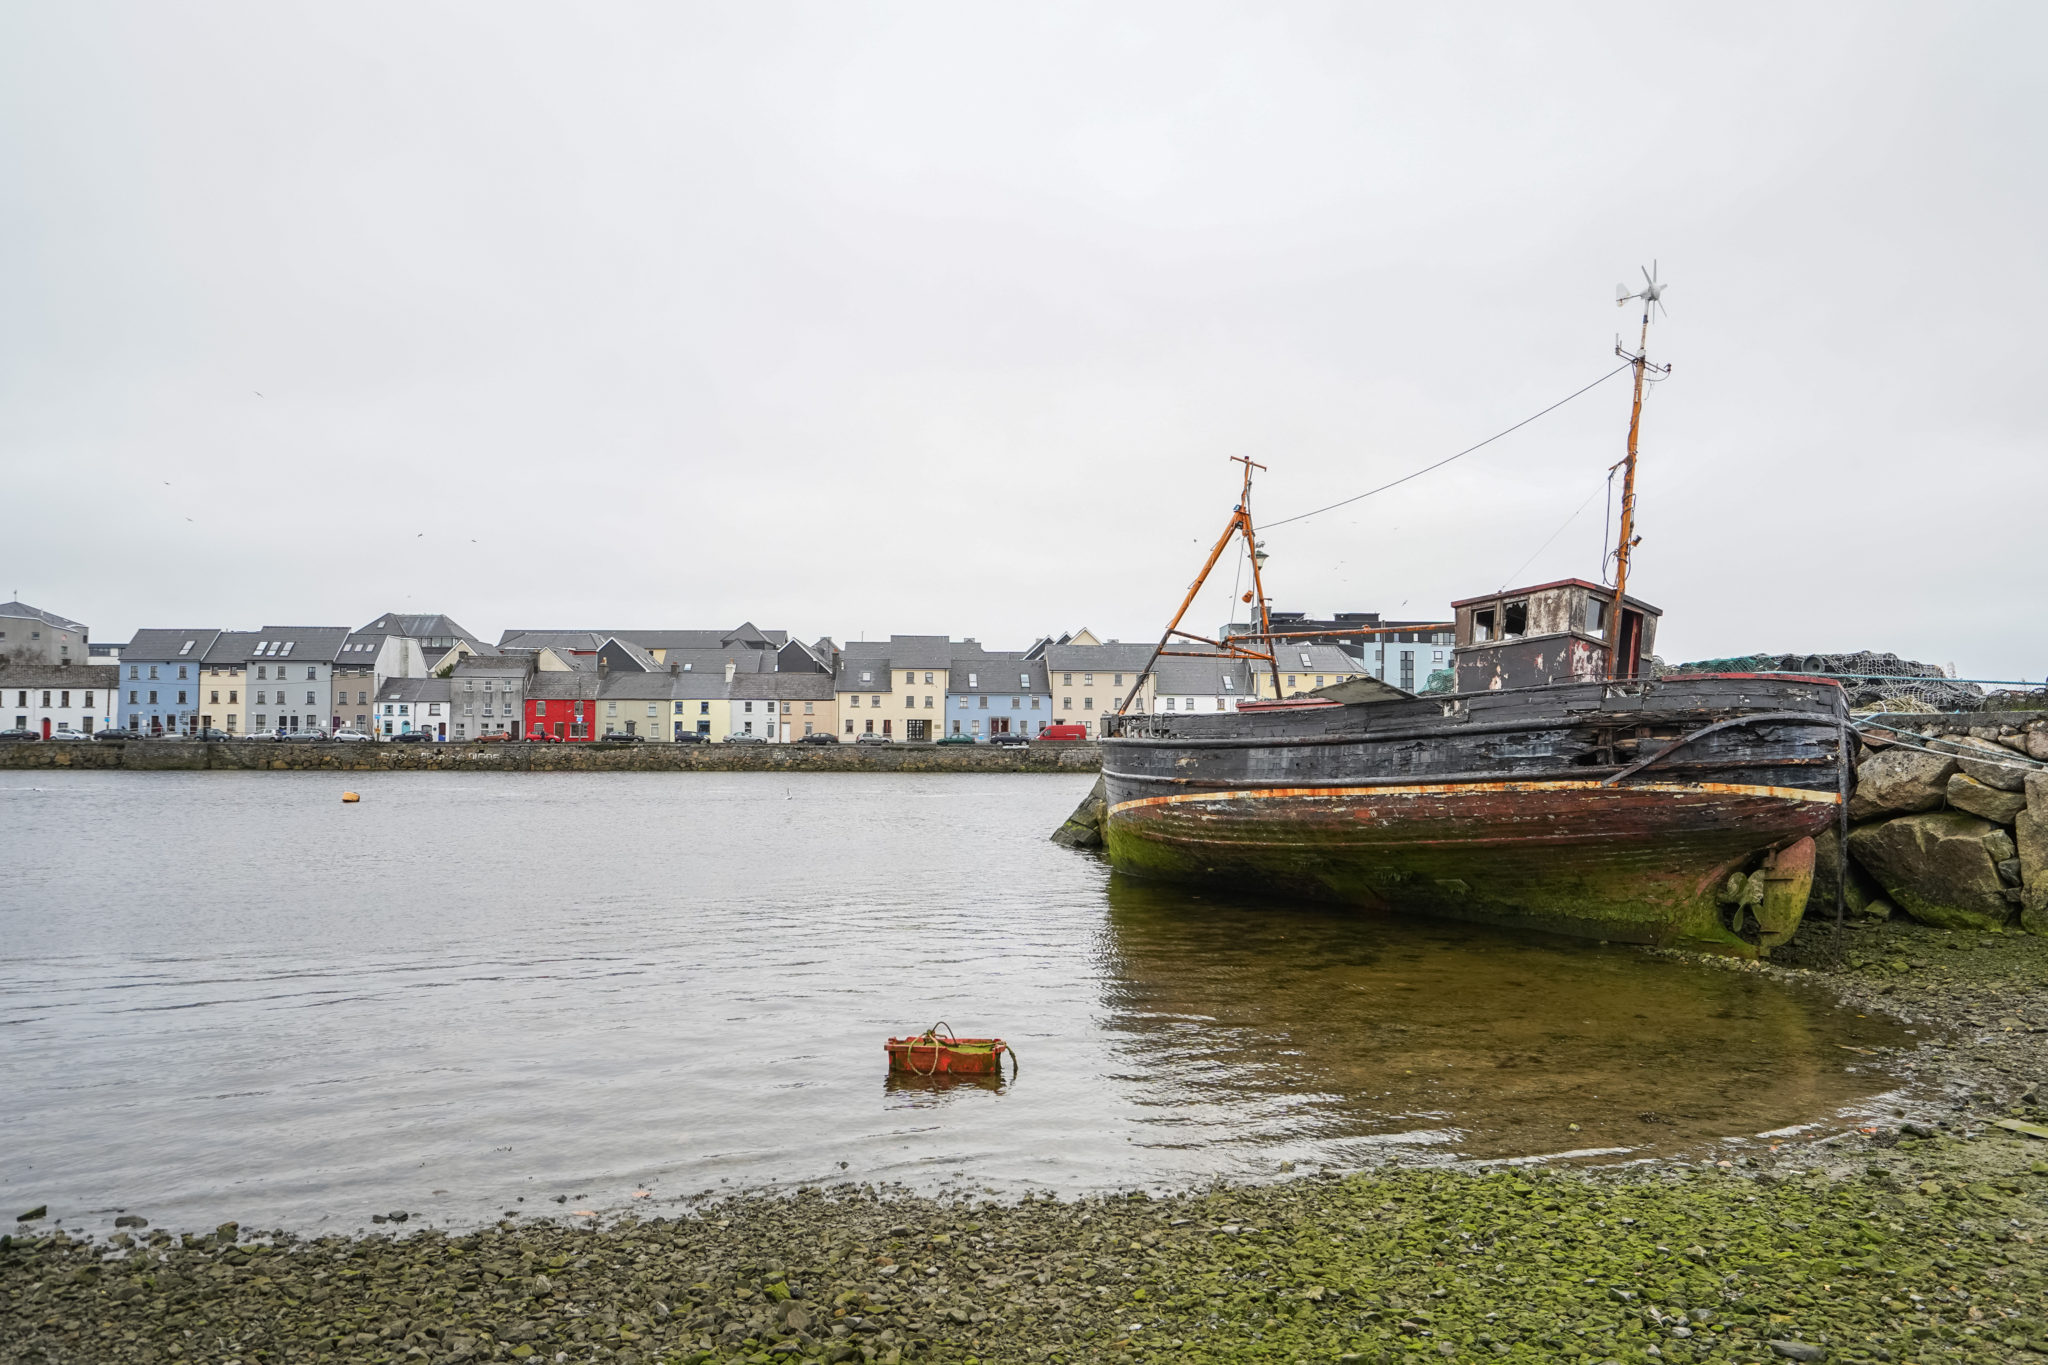 galway-visite-irlande-europe-voyage